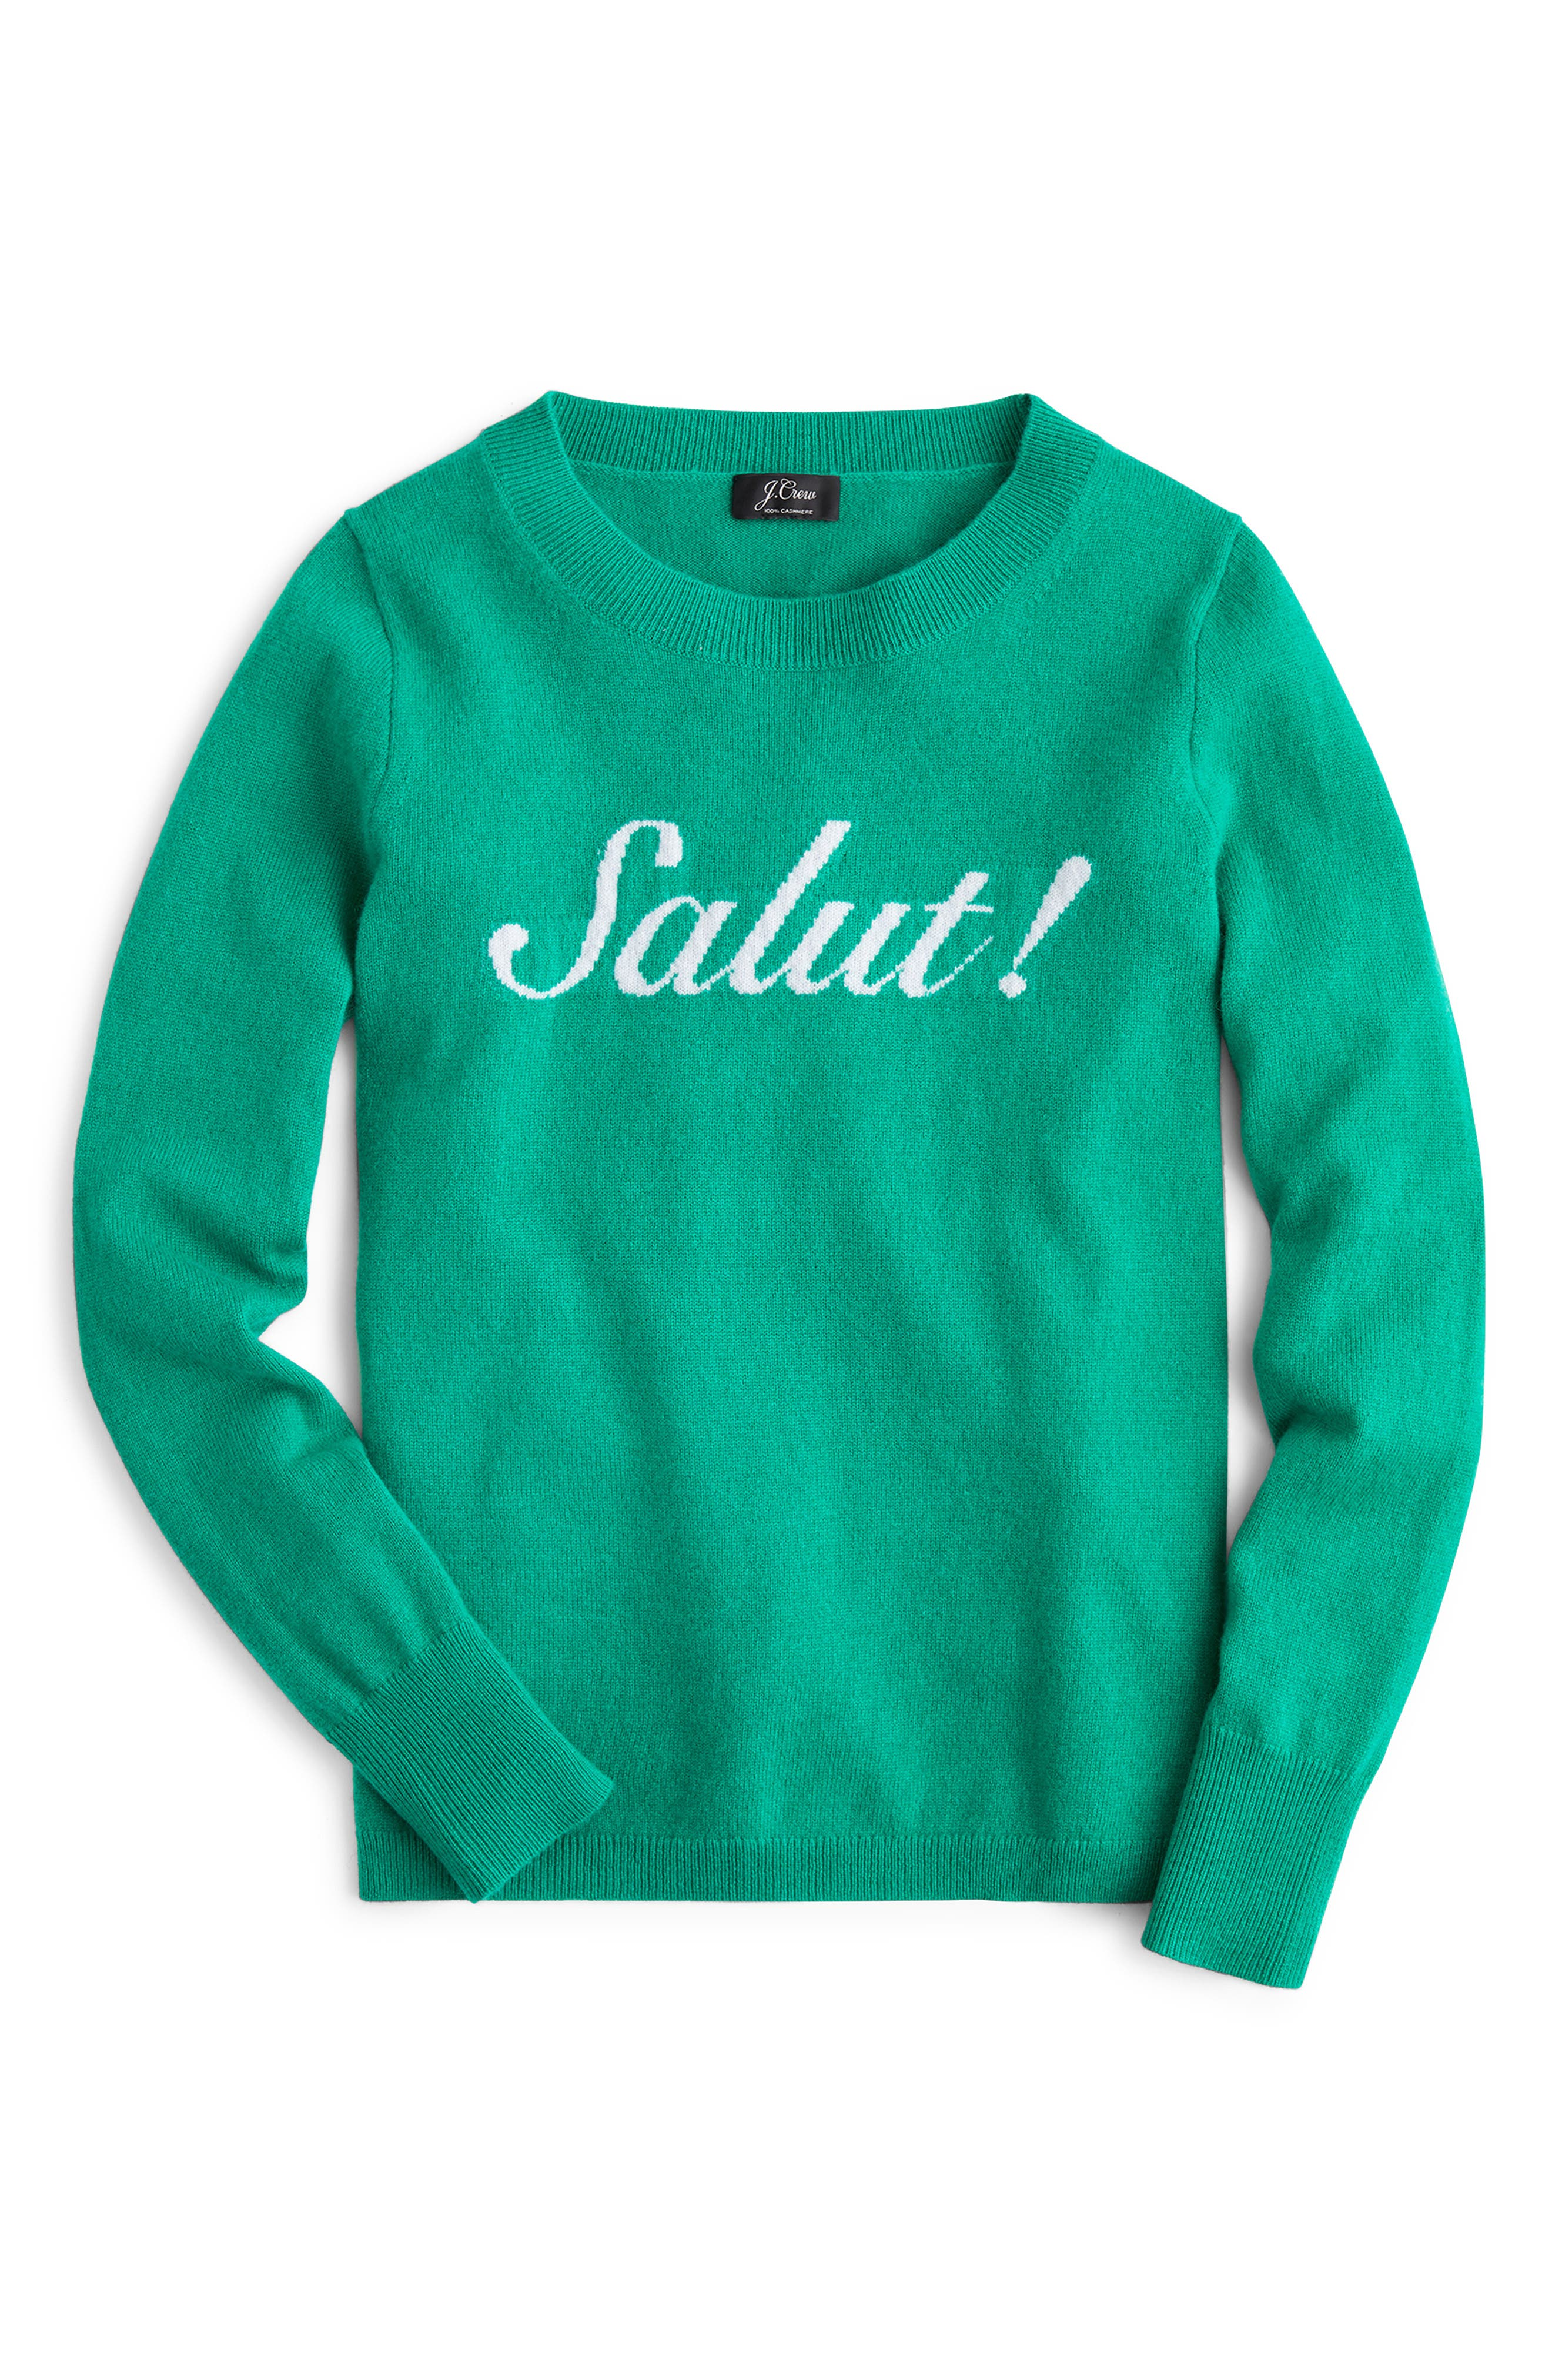 Salut Cashmere Sweater,                         Main,                         color, 300